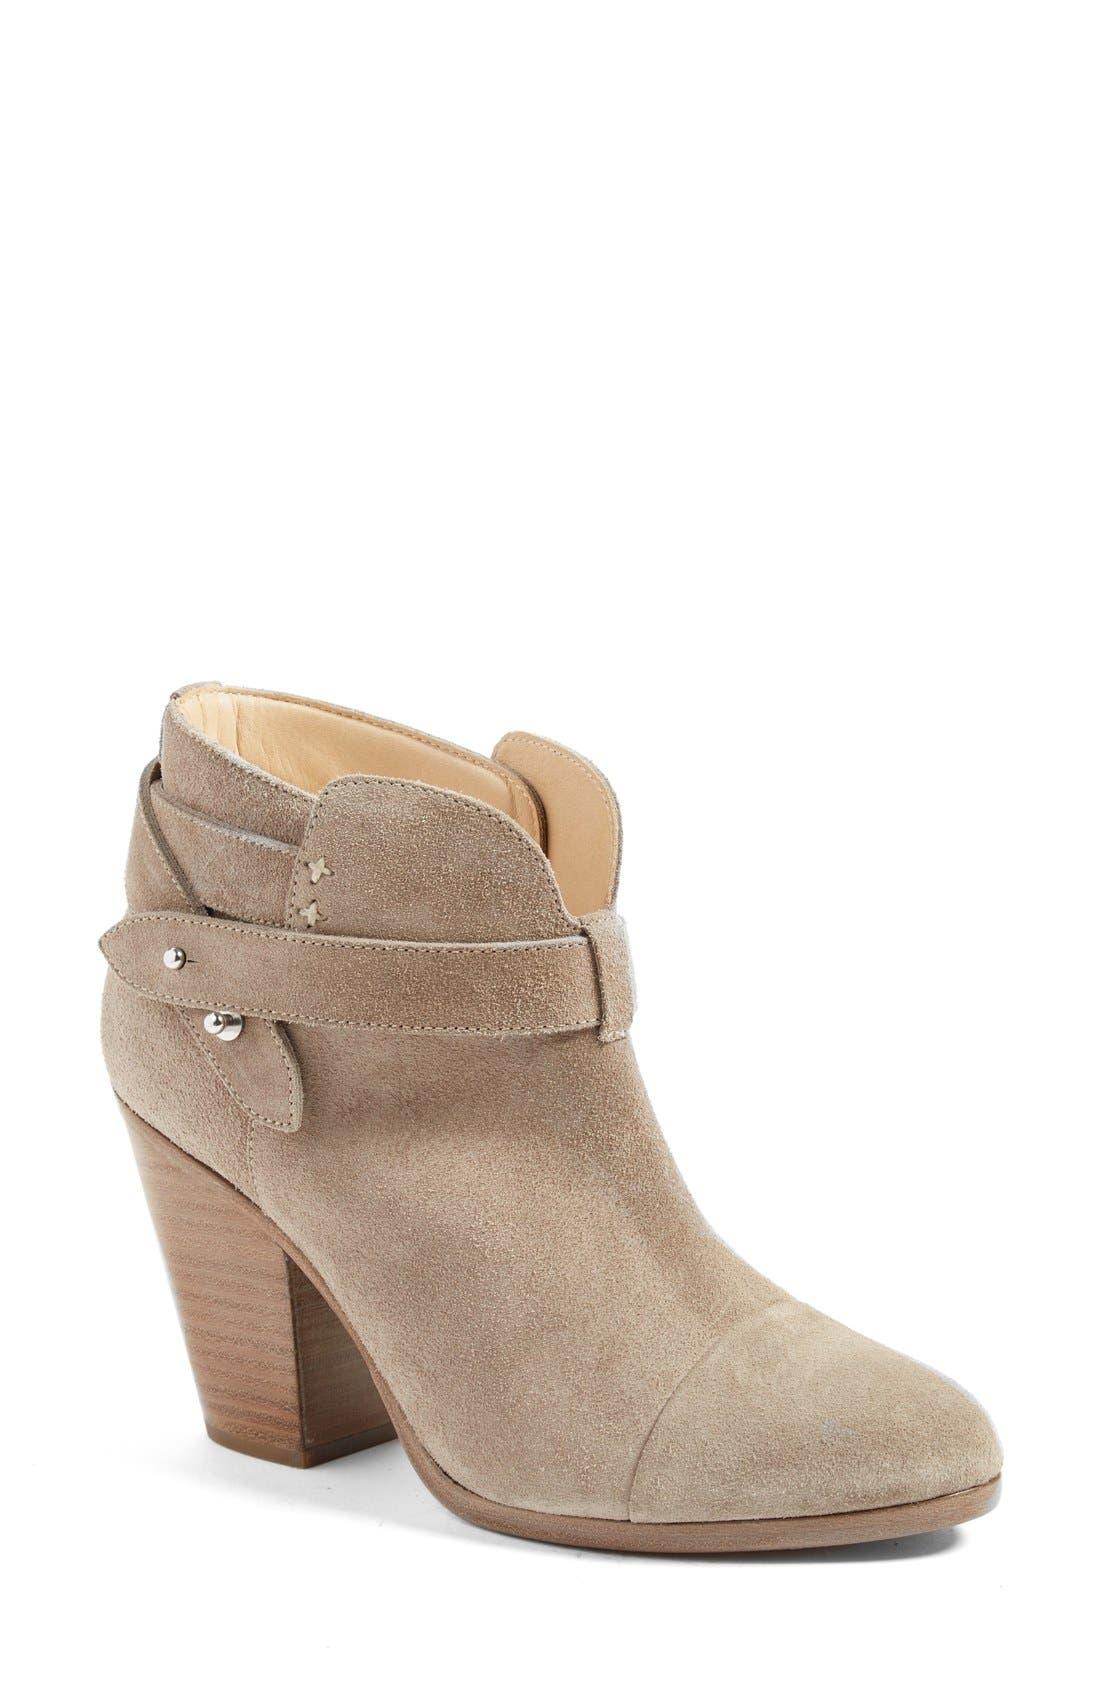 Main Image - rag & bone 'Harrow' Leather Boot